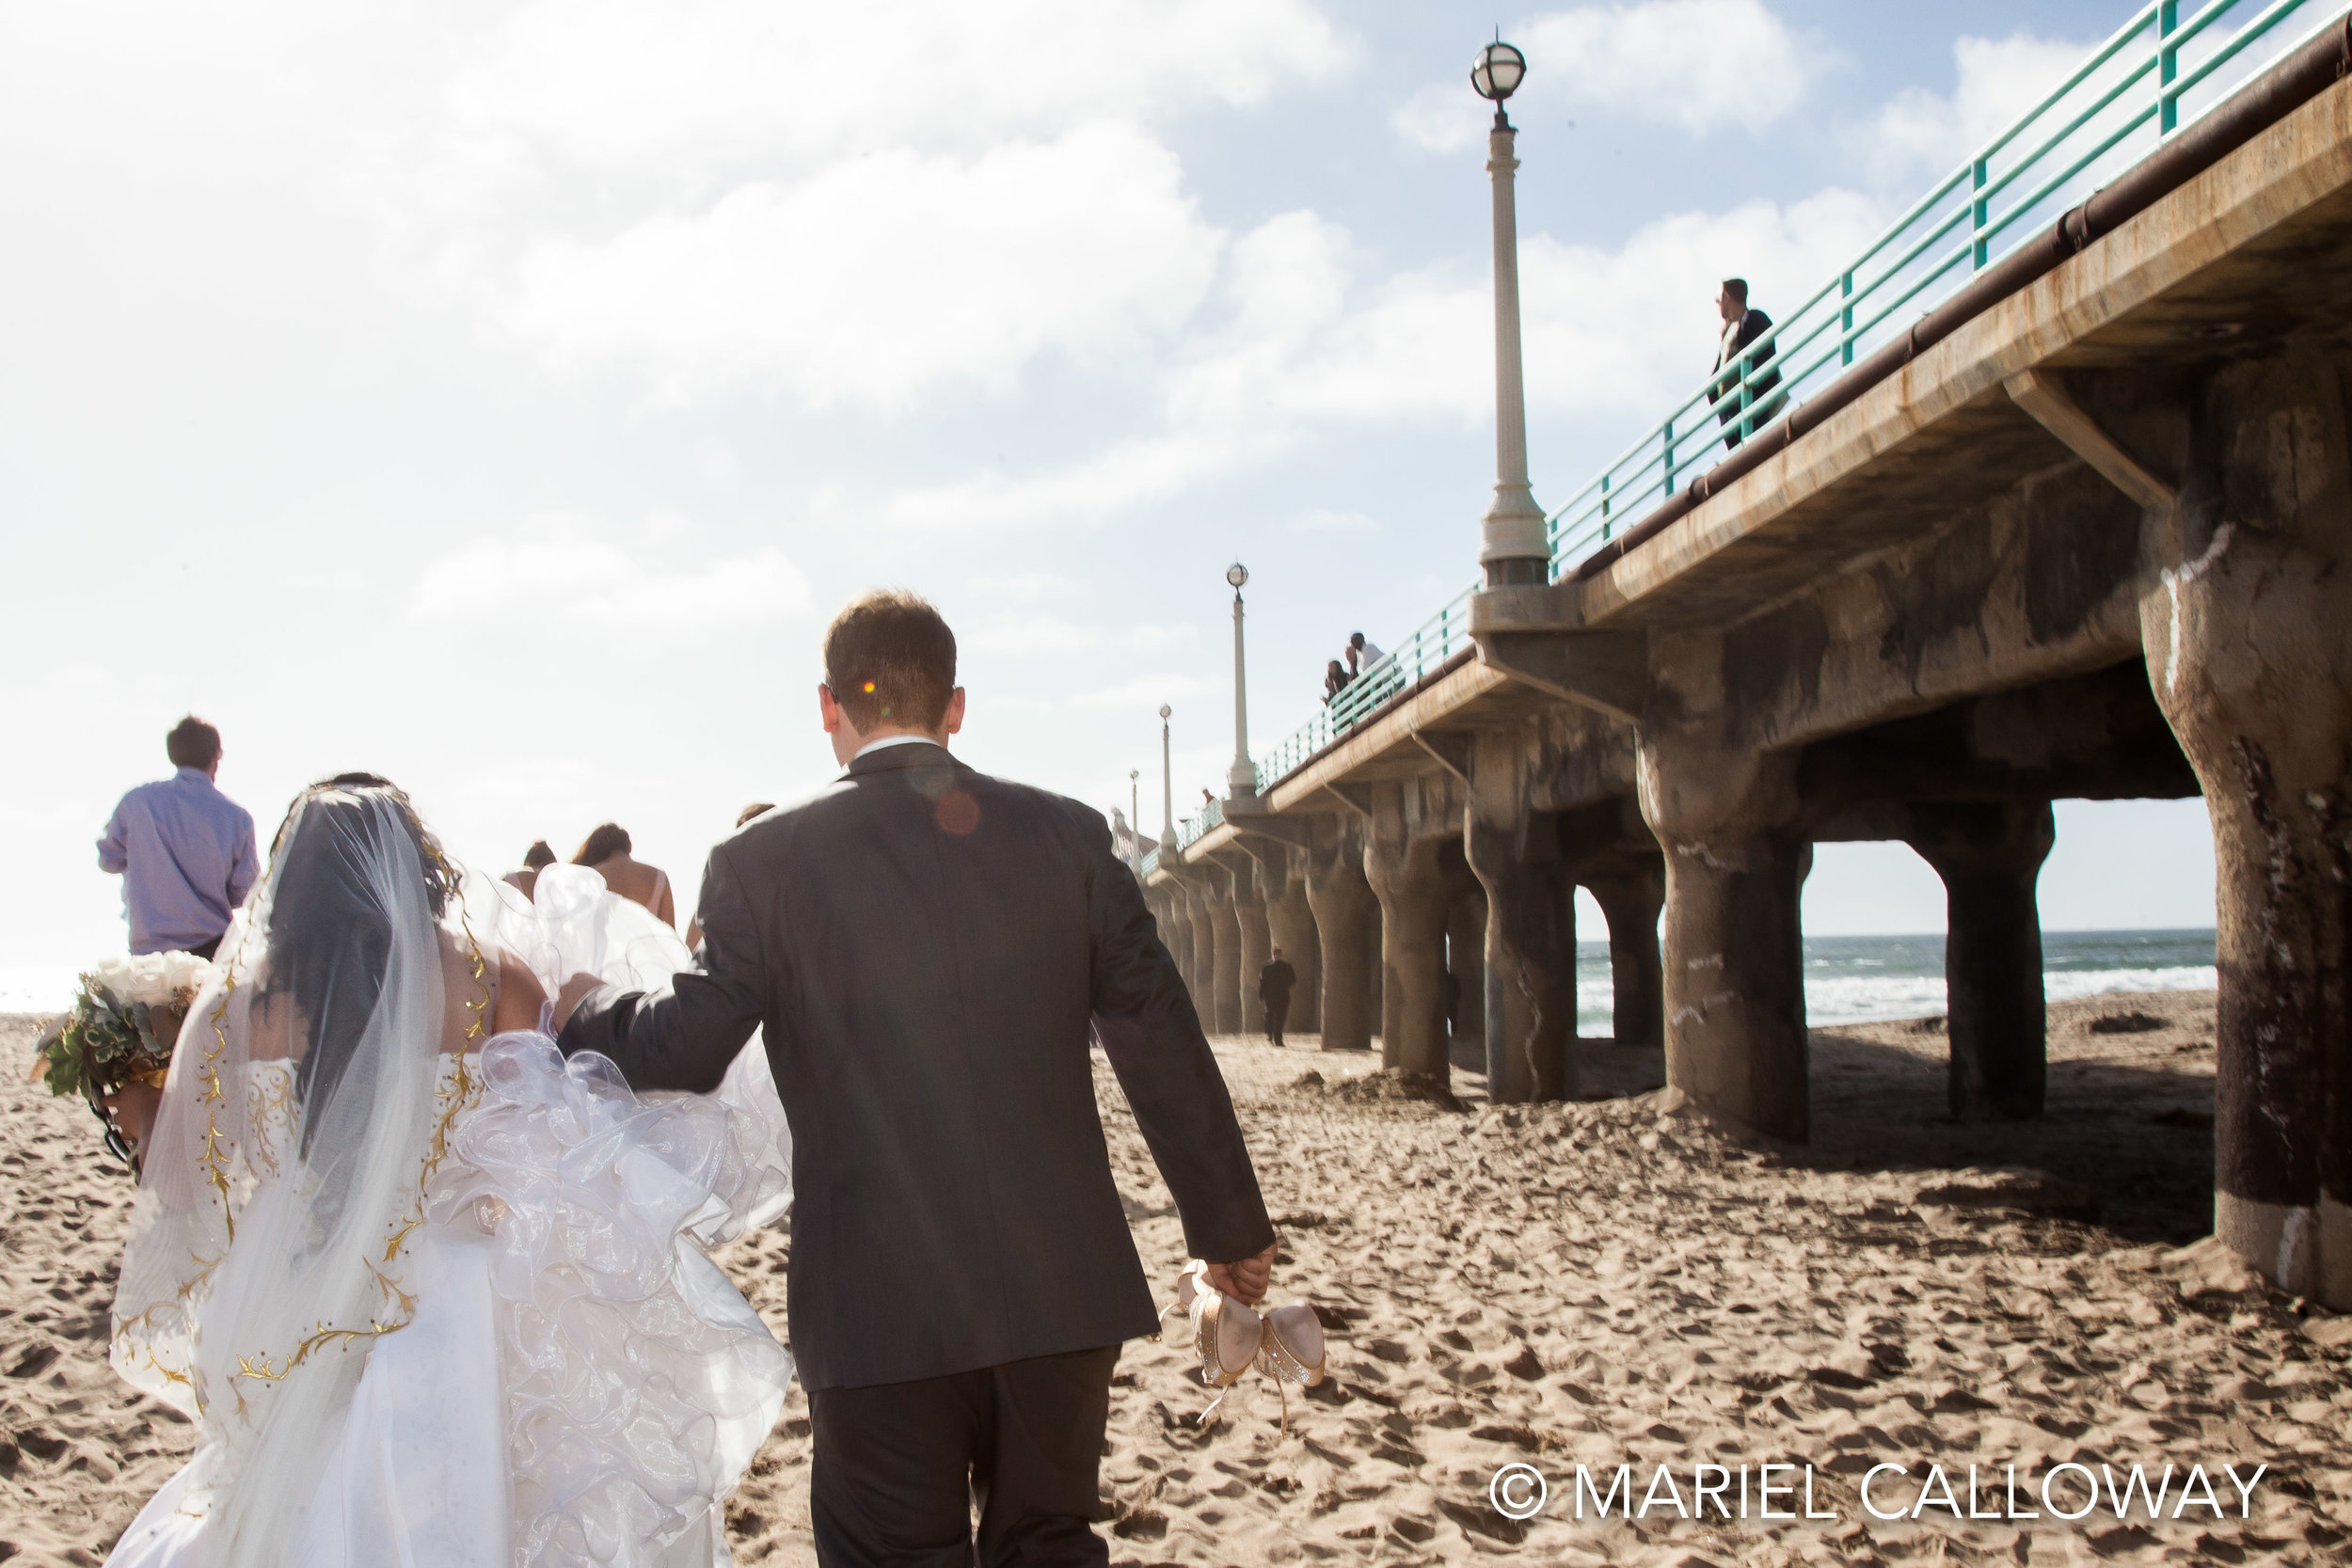 Mariel-Calloway-Los-Angeles-Wedding-Photography-Rossi-51.jpg